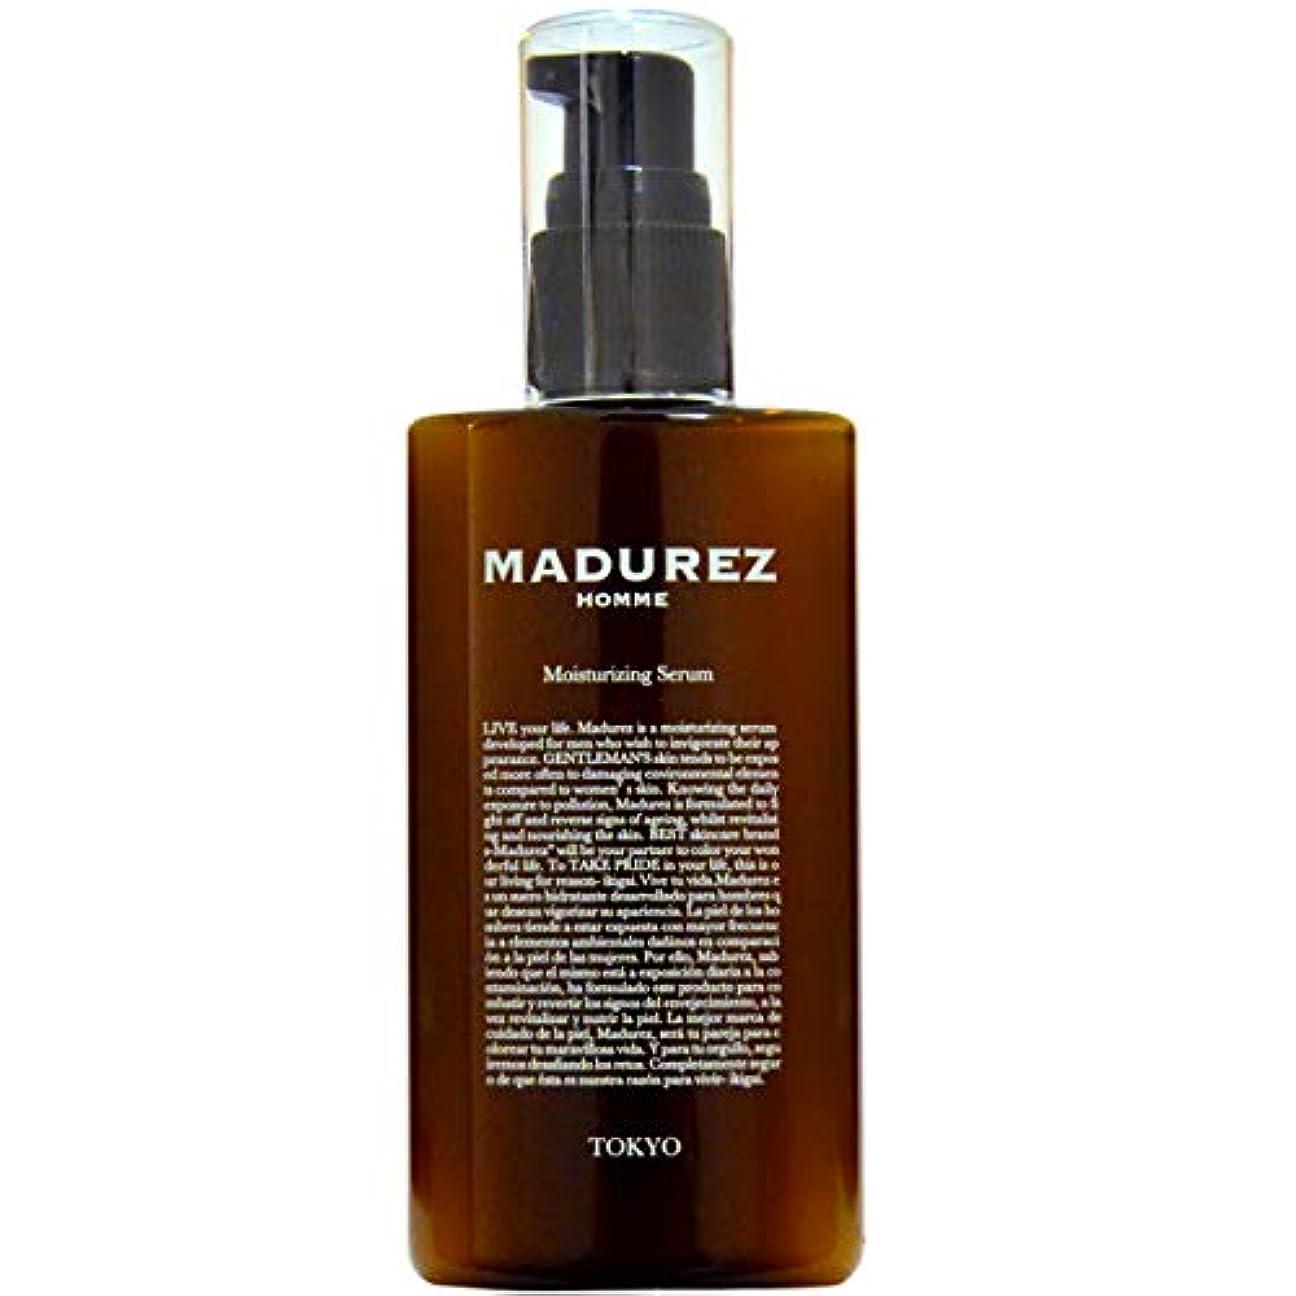 MADUREZ(マドゥレス) 【メンズ】化粧水 オールインワン 100ml(約3ヶ月分) アフターシェーブ ローション 30代40代50代の男性向け 顔用 スキンケア